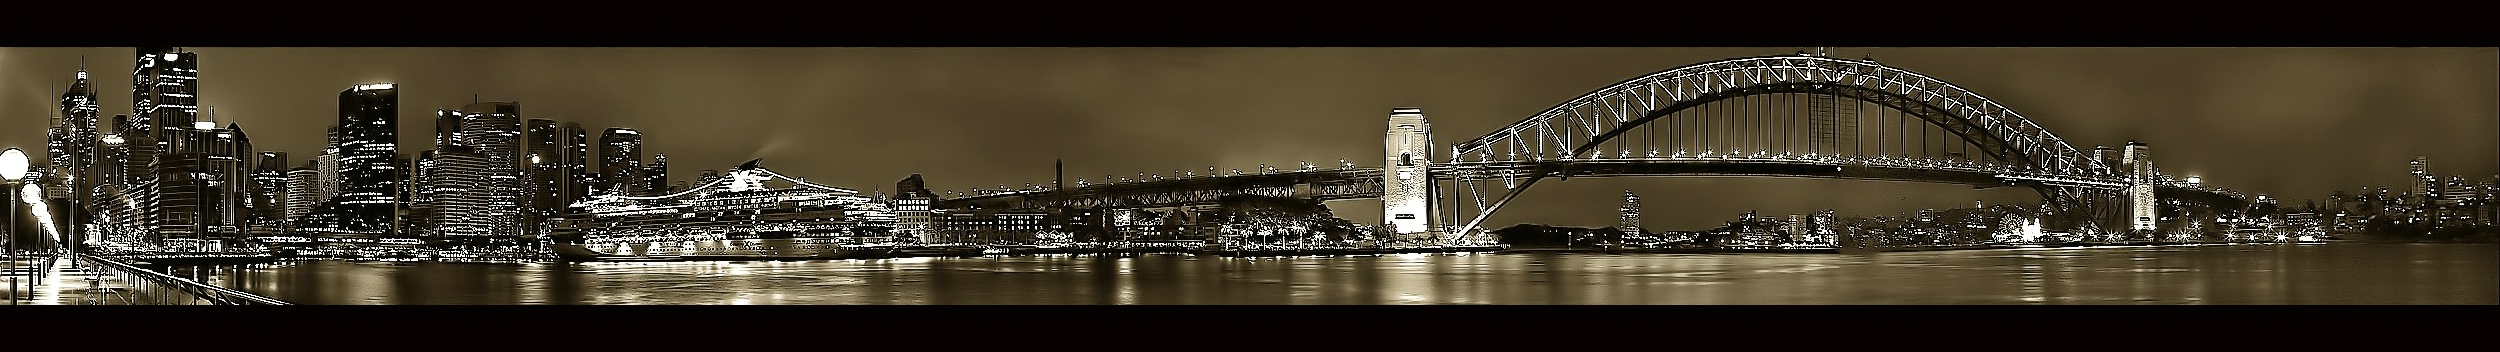 Sydney by night3